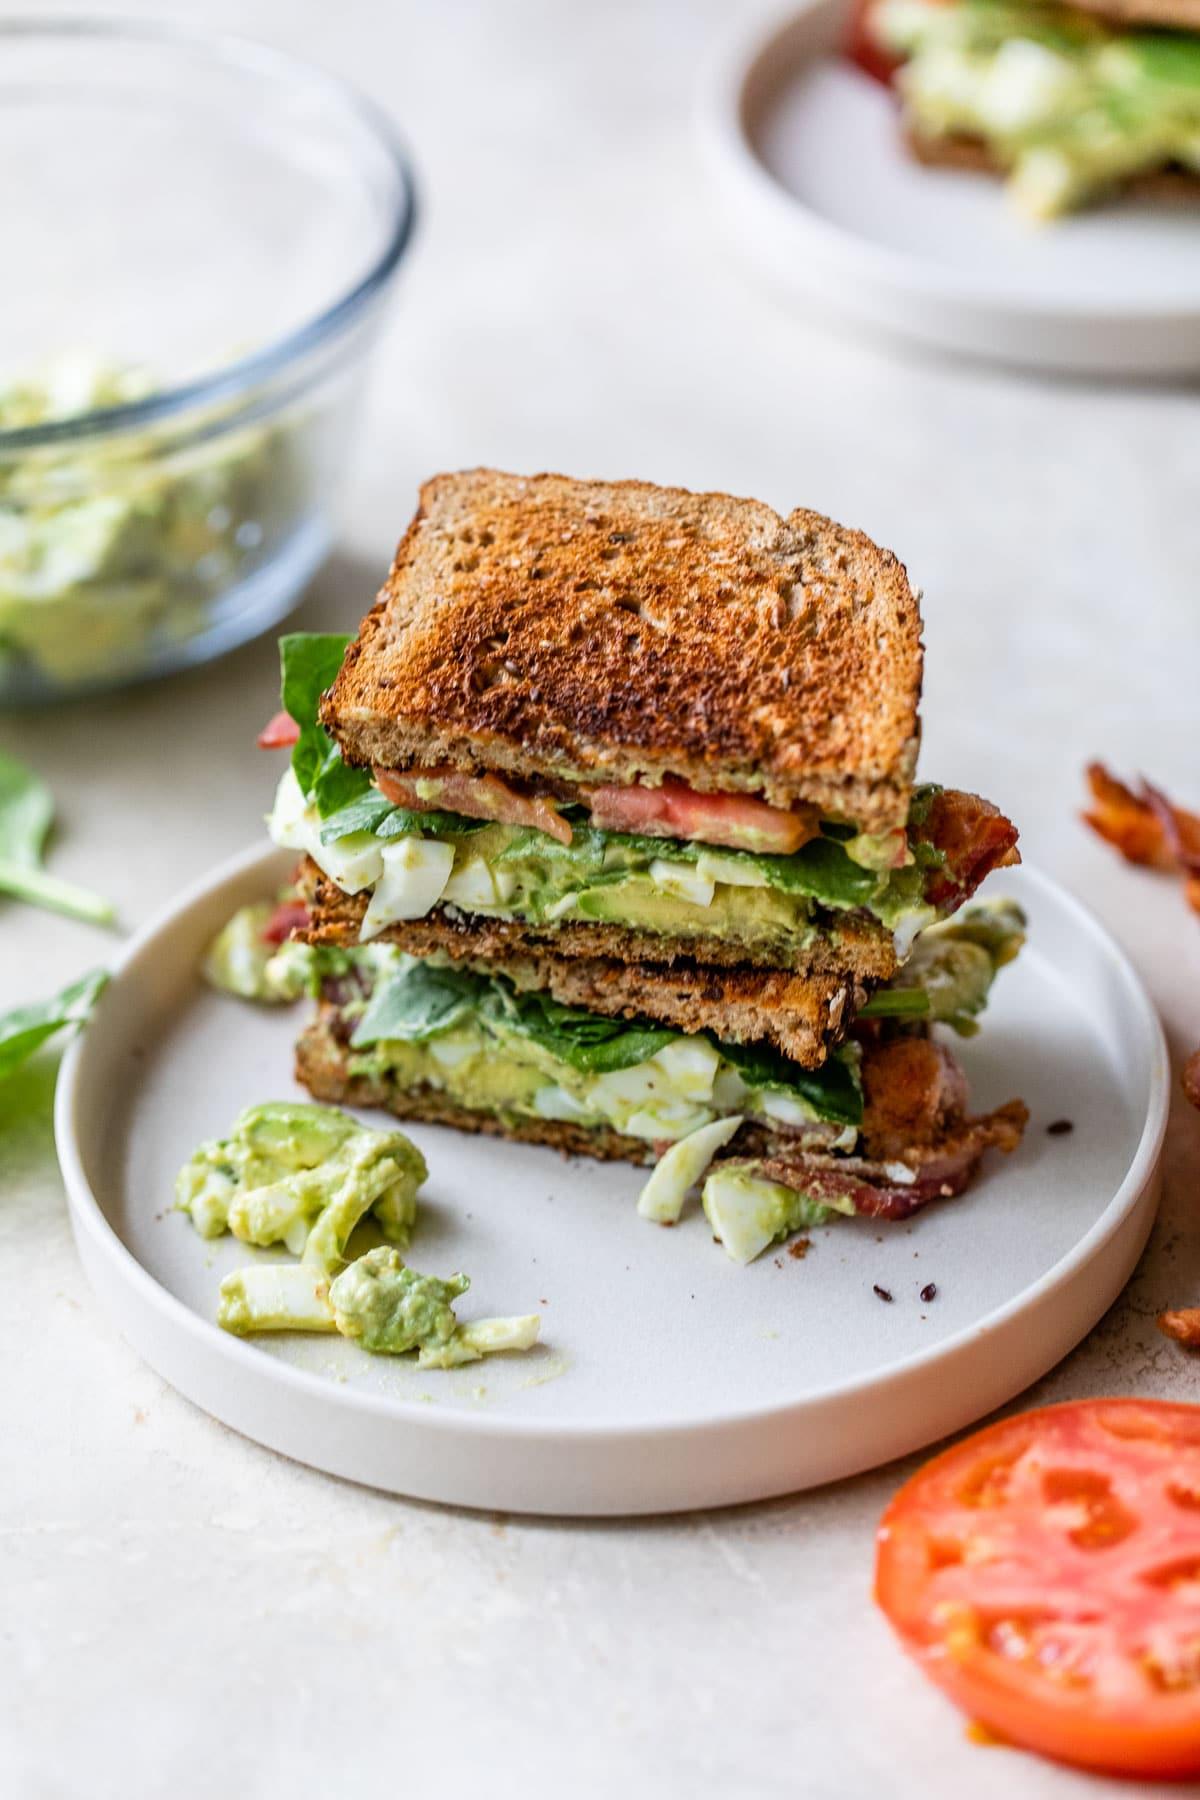 Avocado Egg Salad Bacon Sandwiches on toasted bread